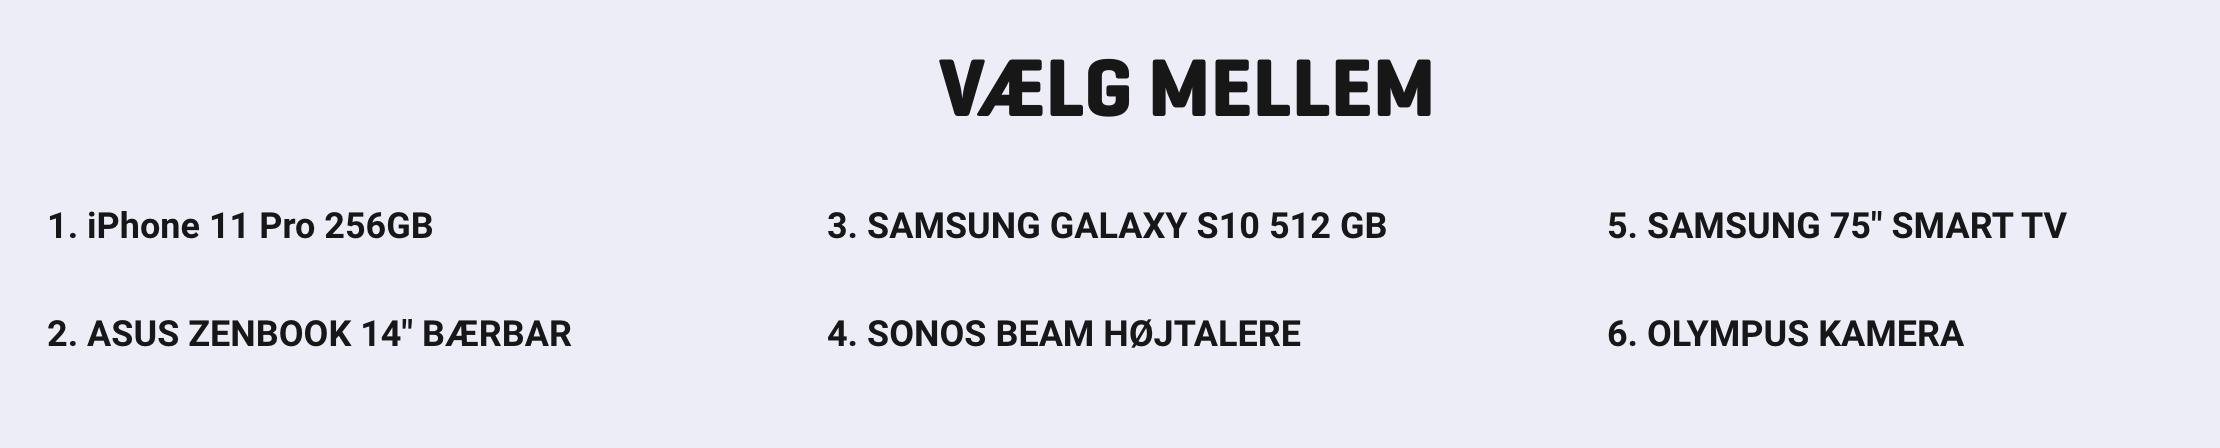 Vind en iphone - casinoerdanmark.dk